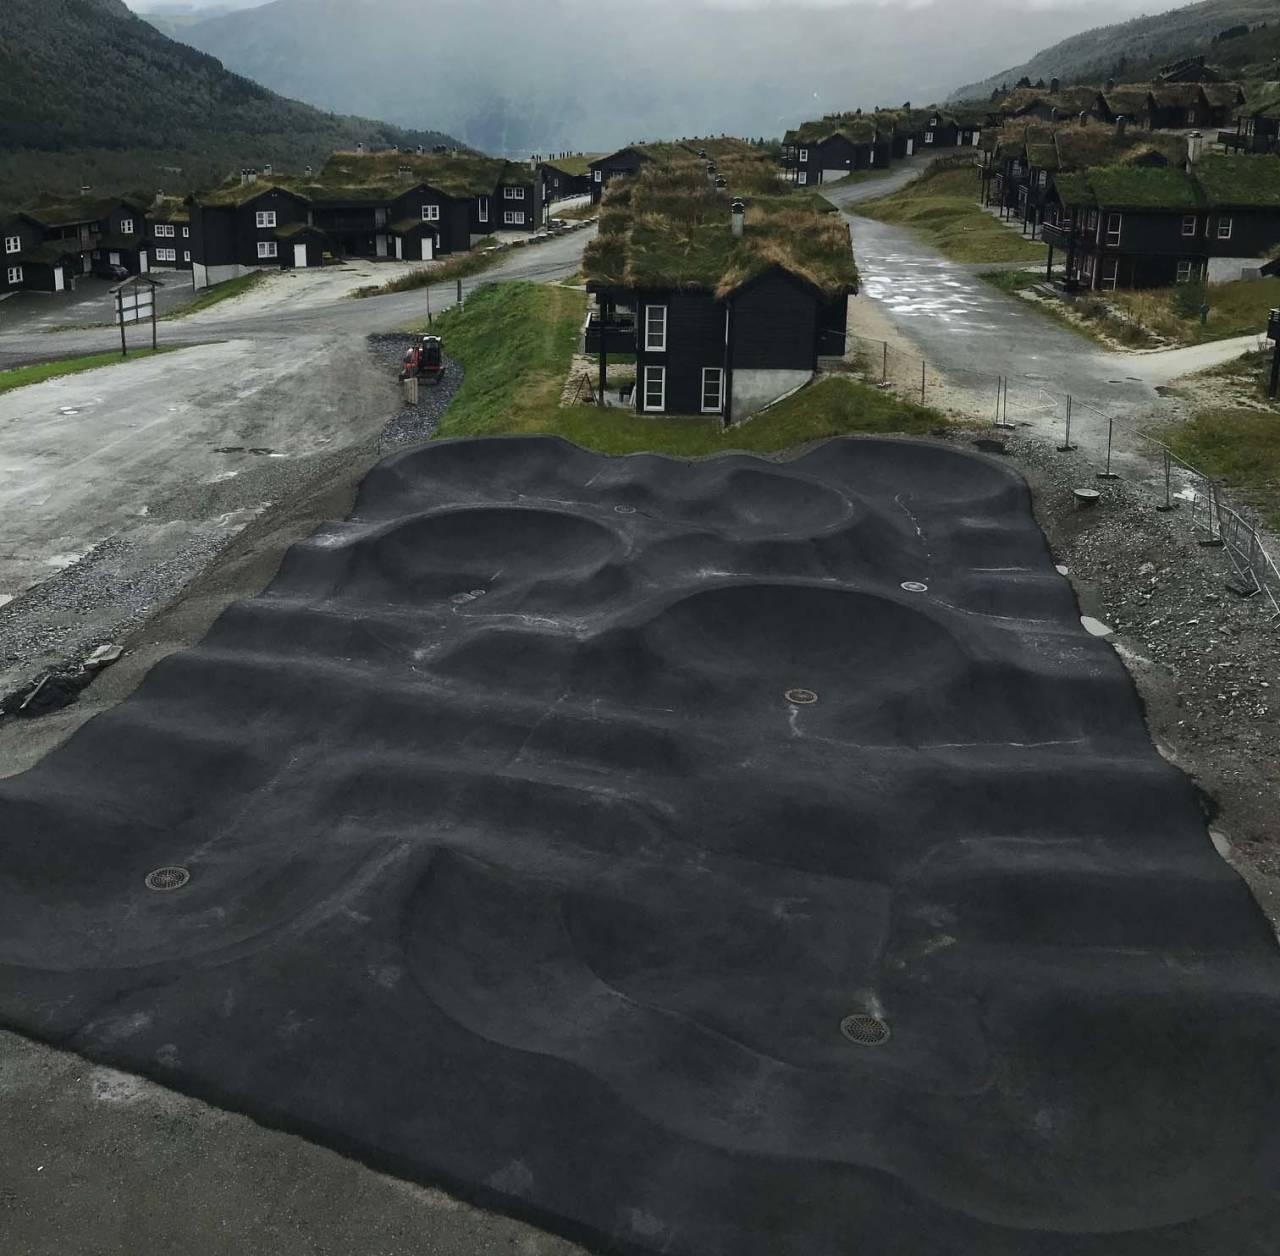 ASFALTERT: Pumptracken i Myrkdalen har asfaltdekke. Foto: Joar Wæhle